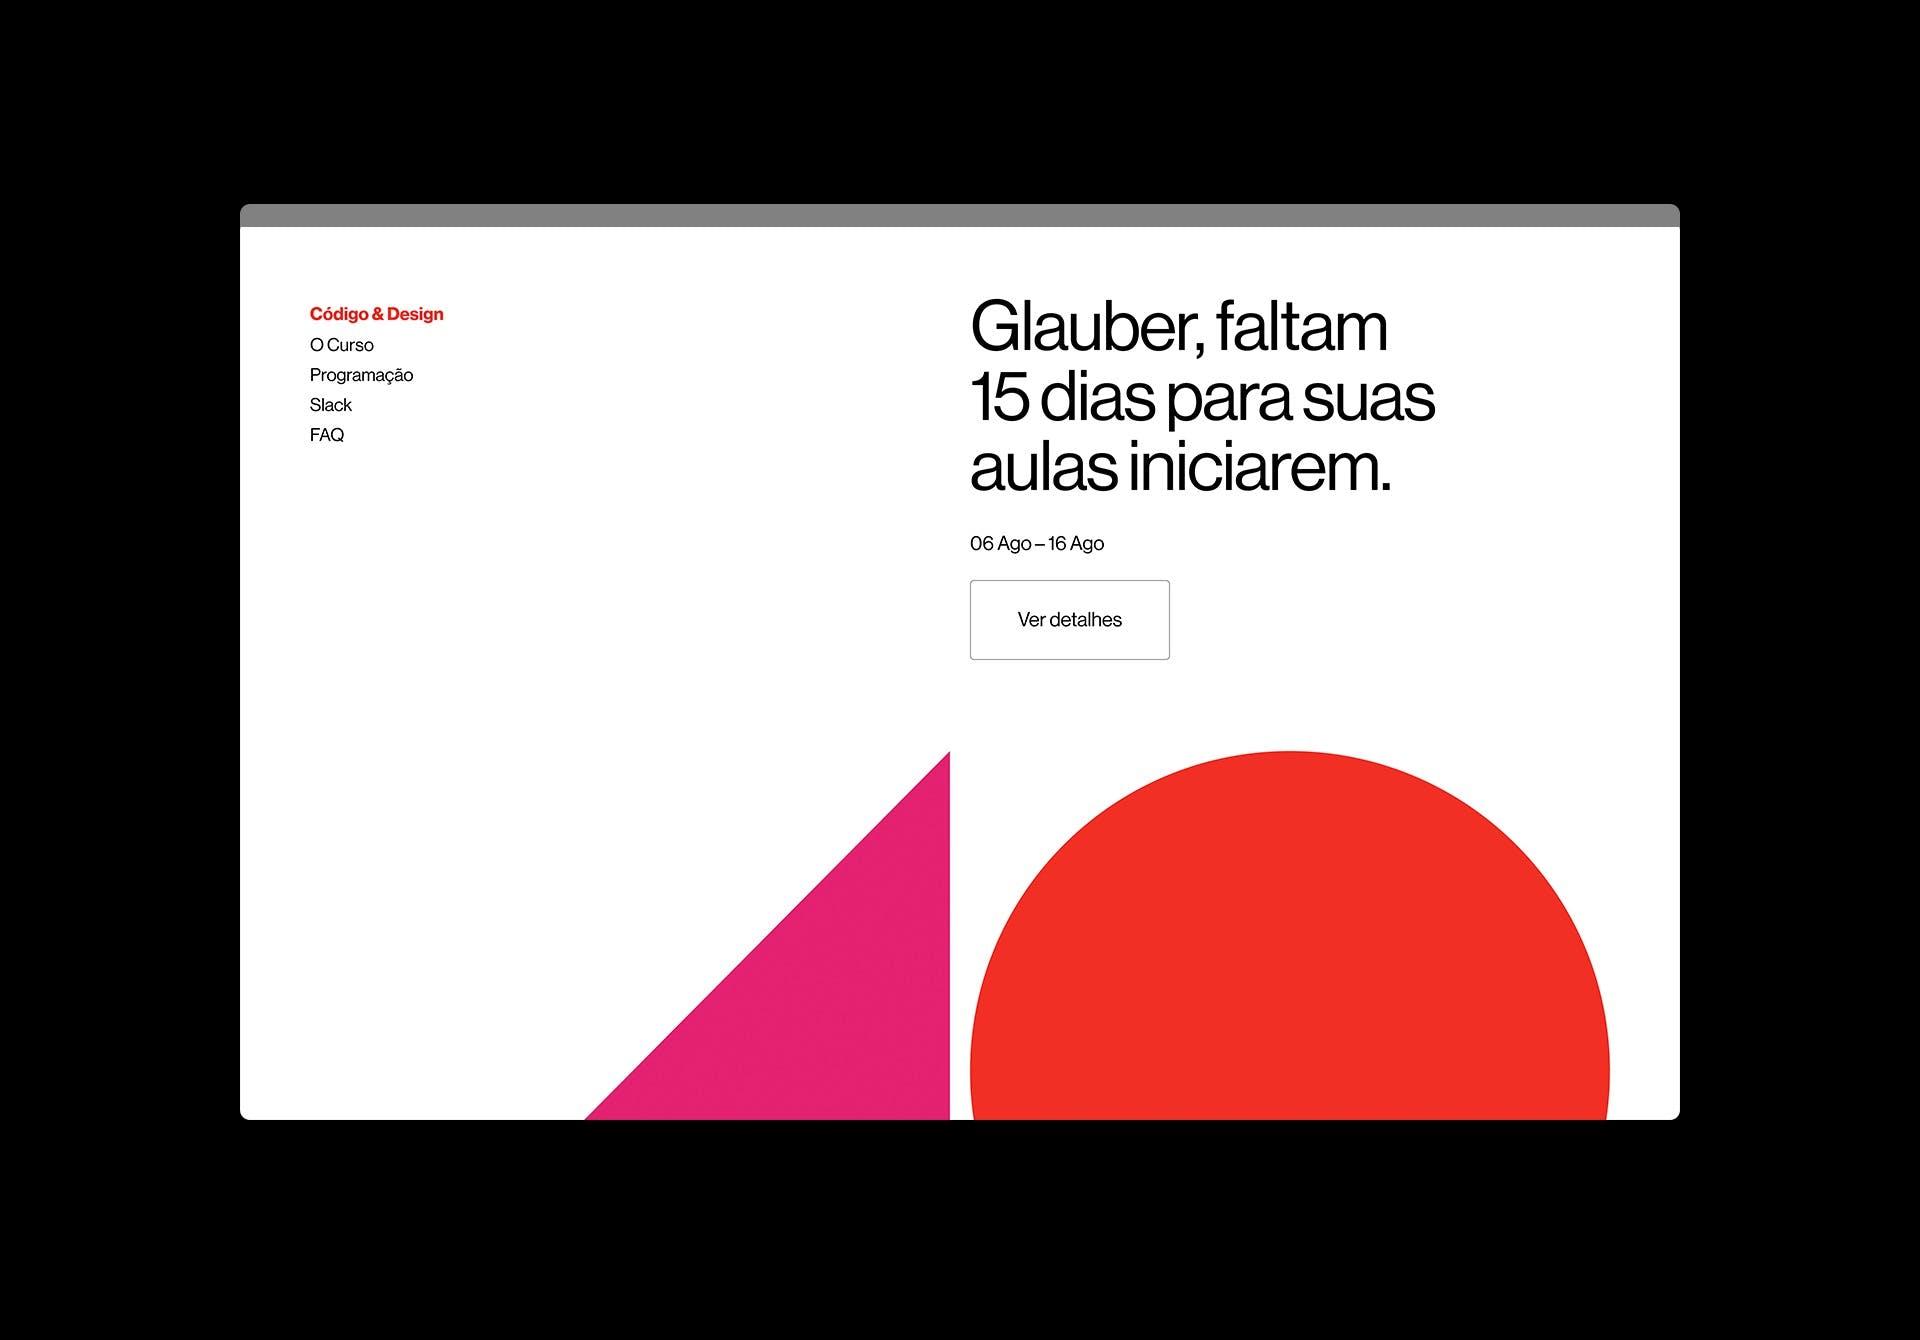 glauber-sampaio-codigo-design-1.jpeg